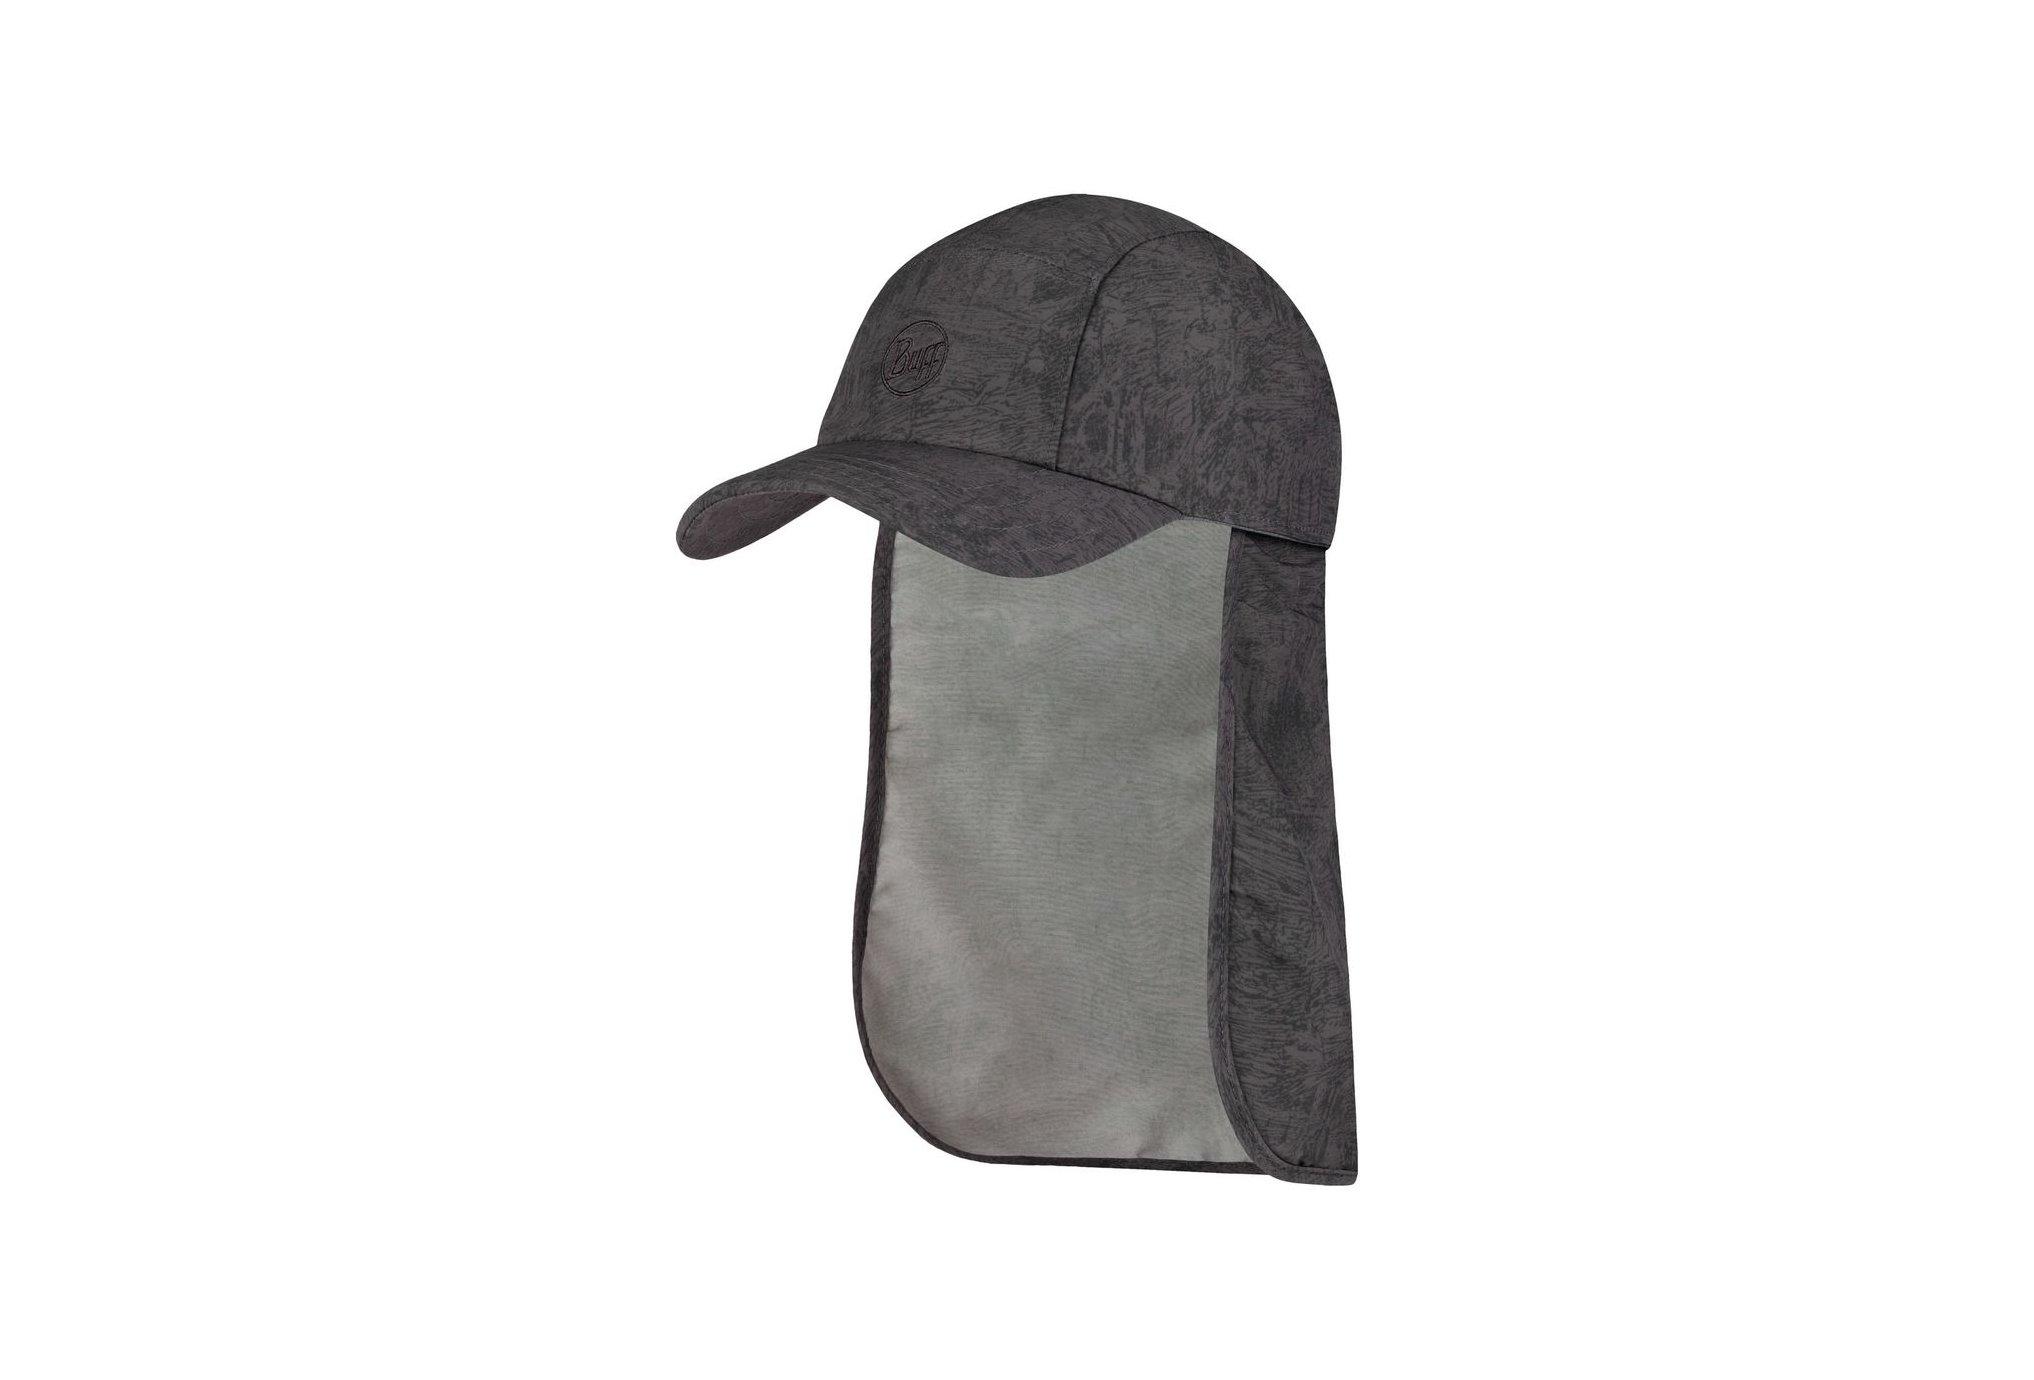 Buff Bimini zinc dark grey casquettes / bandeaux